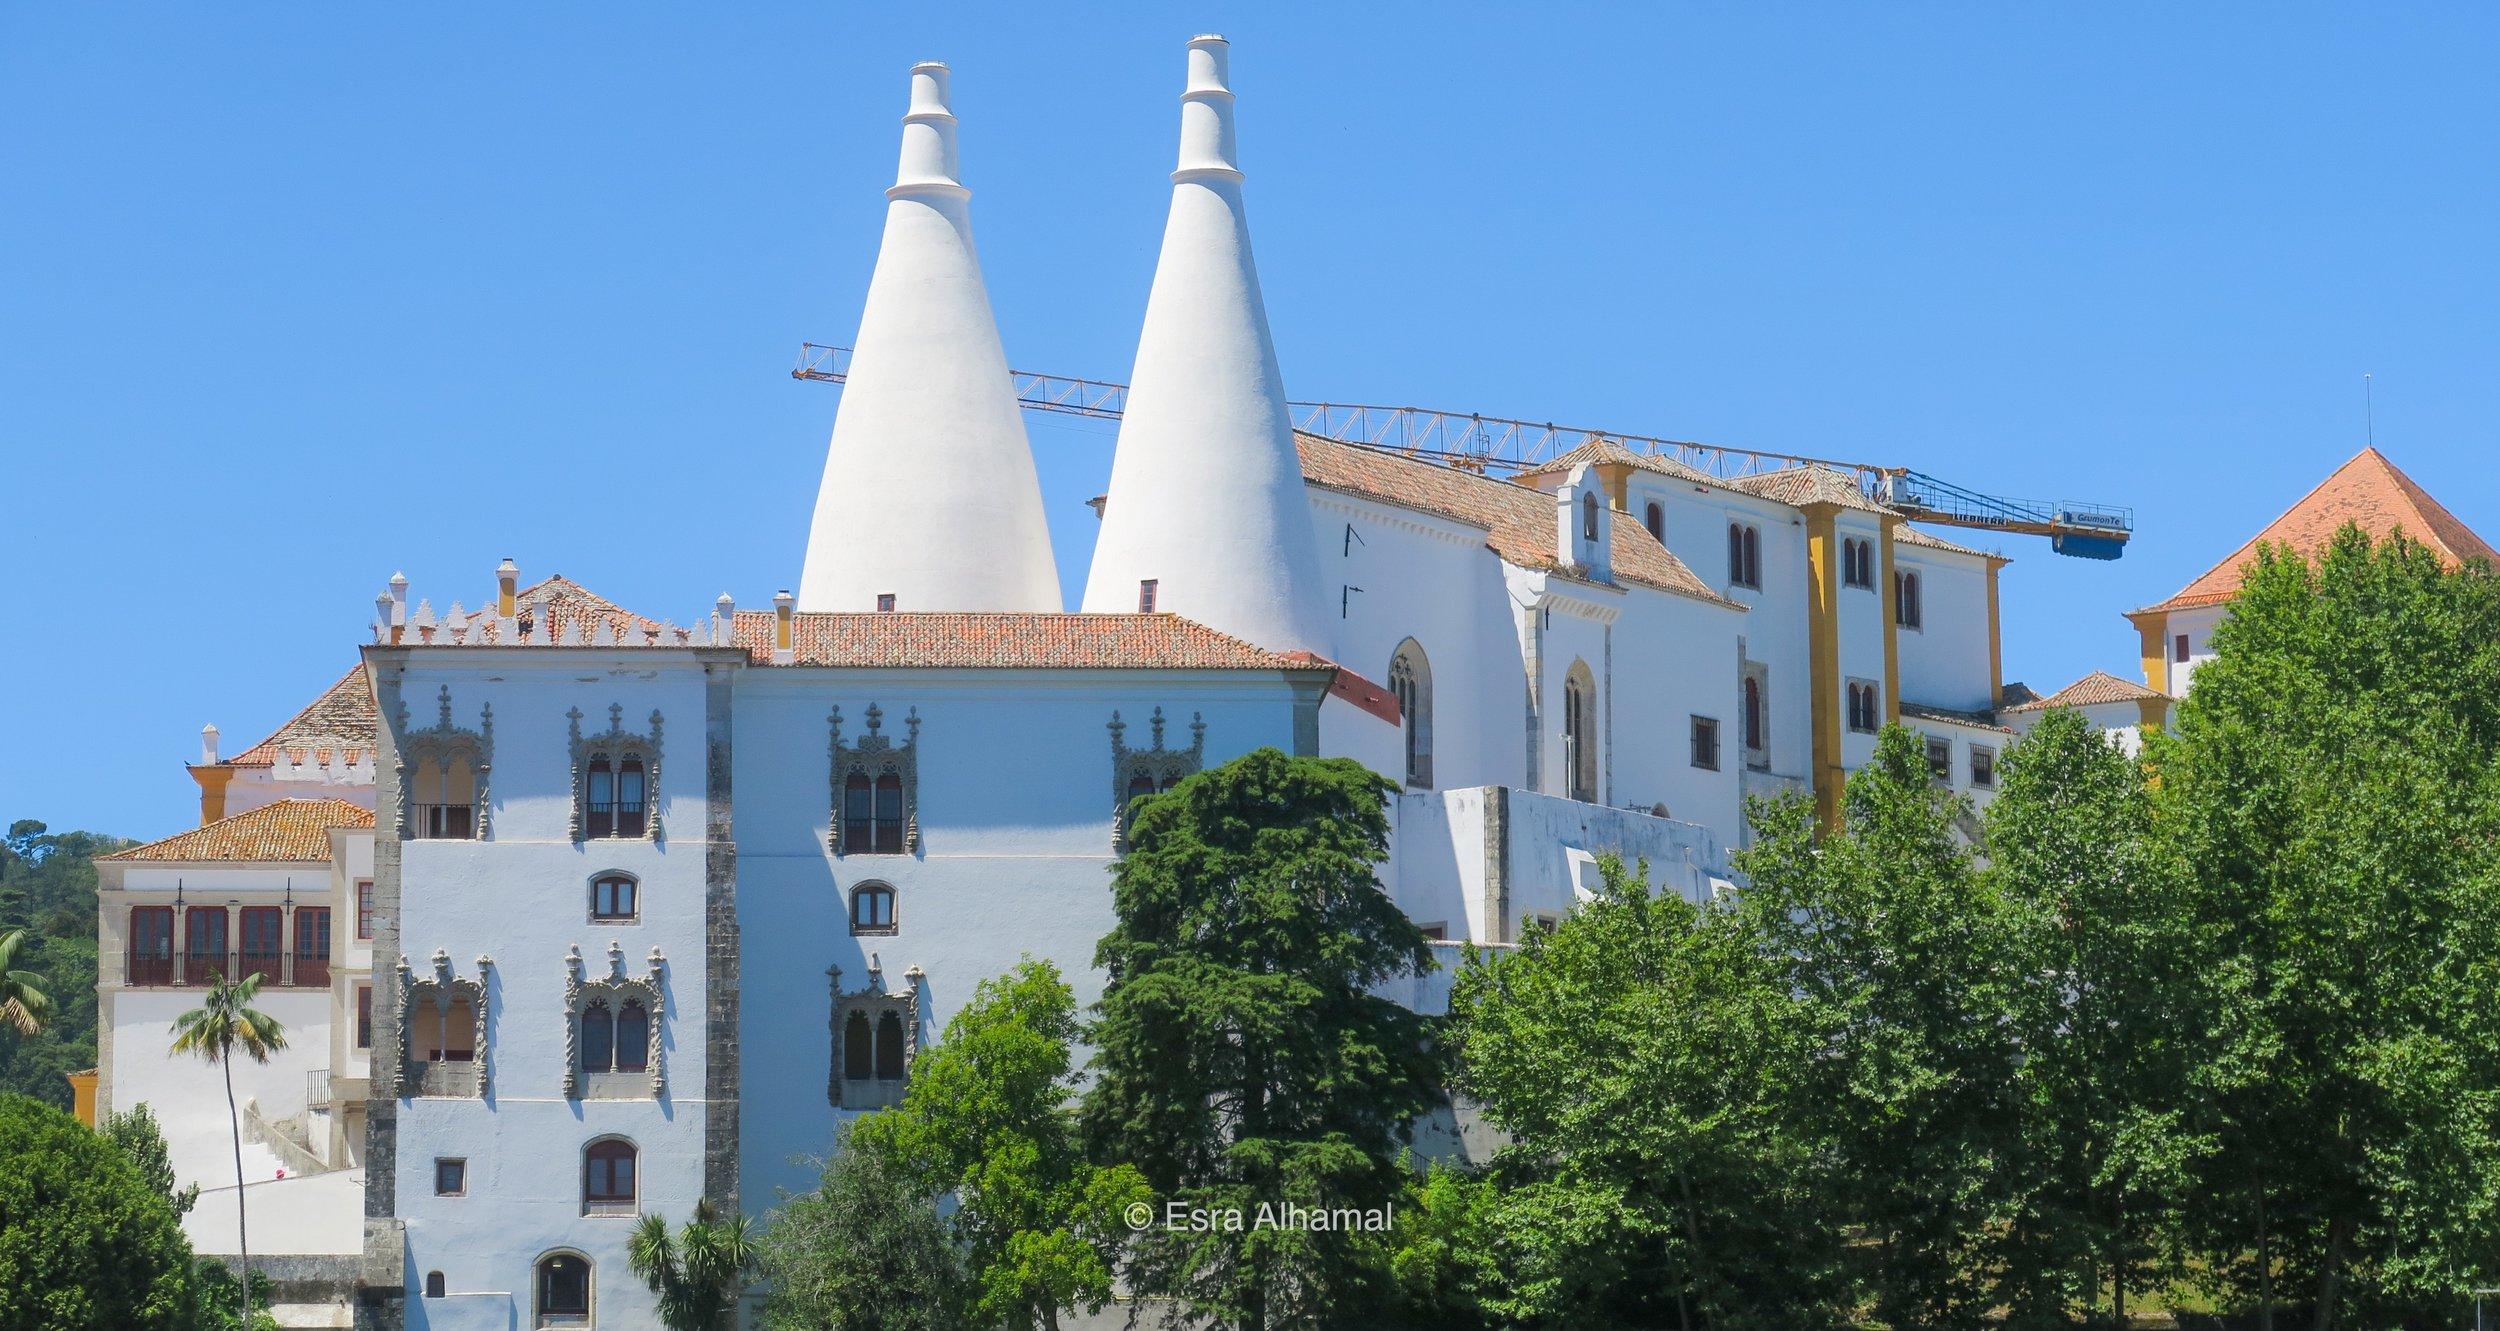 Sintra Palace